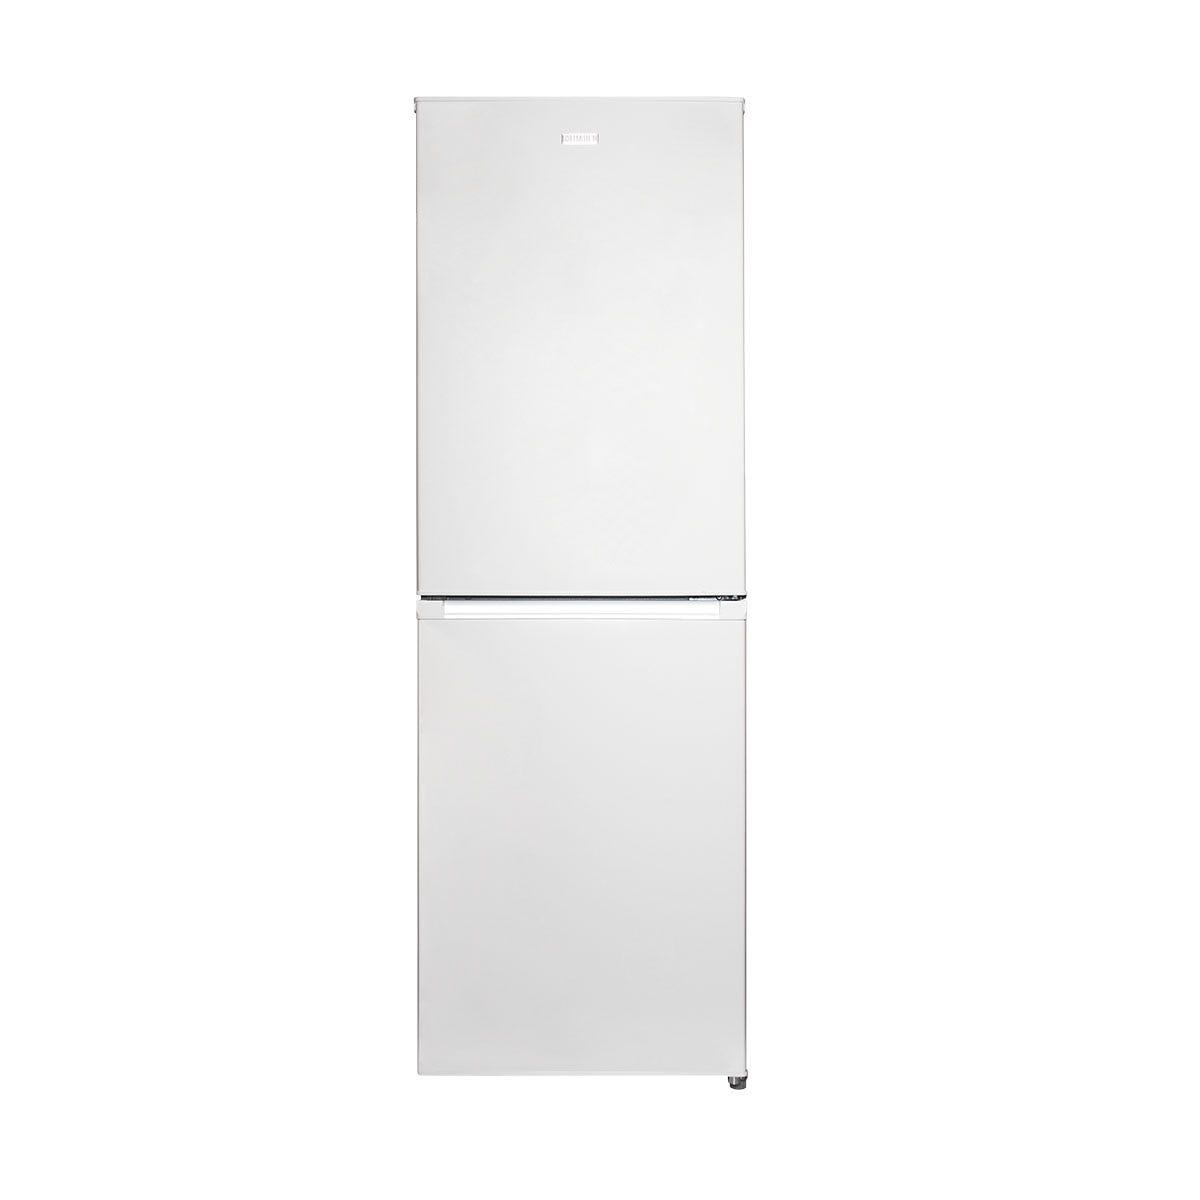 Haden HFF180W 55cm Total No Frost 50:50 225L Fridge Freezer - White